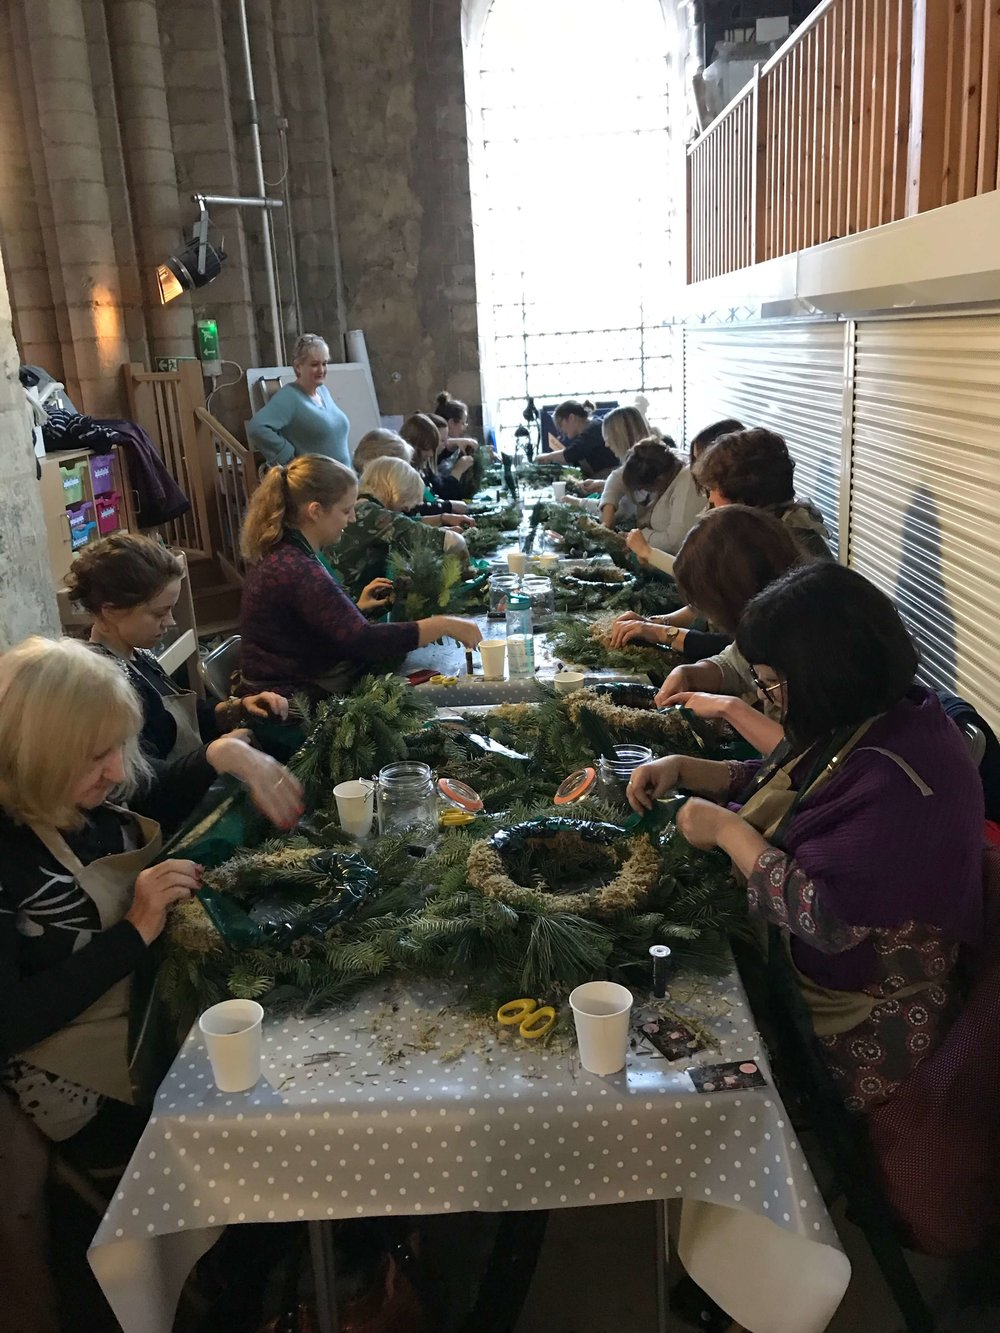 Christmas Wreath Making Workshop Ely Cambridgeshire 2nd December (1).jpg